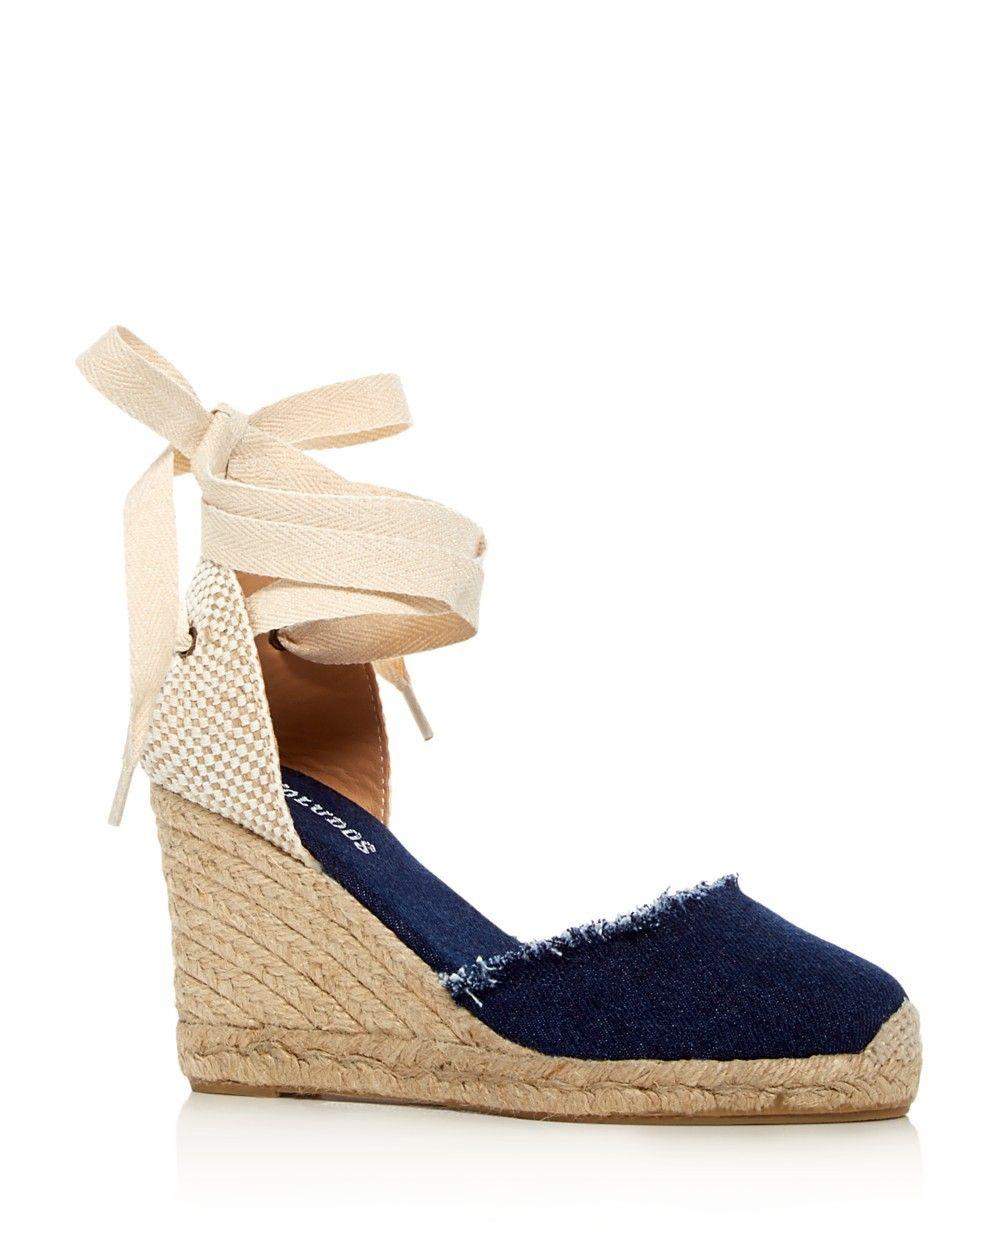 SOLUDOS. Sandals OnlineDark DenimWedge ...